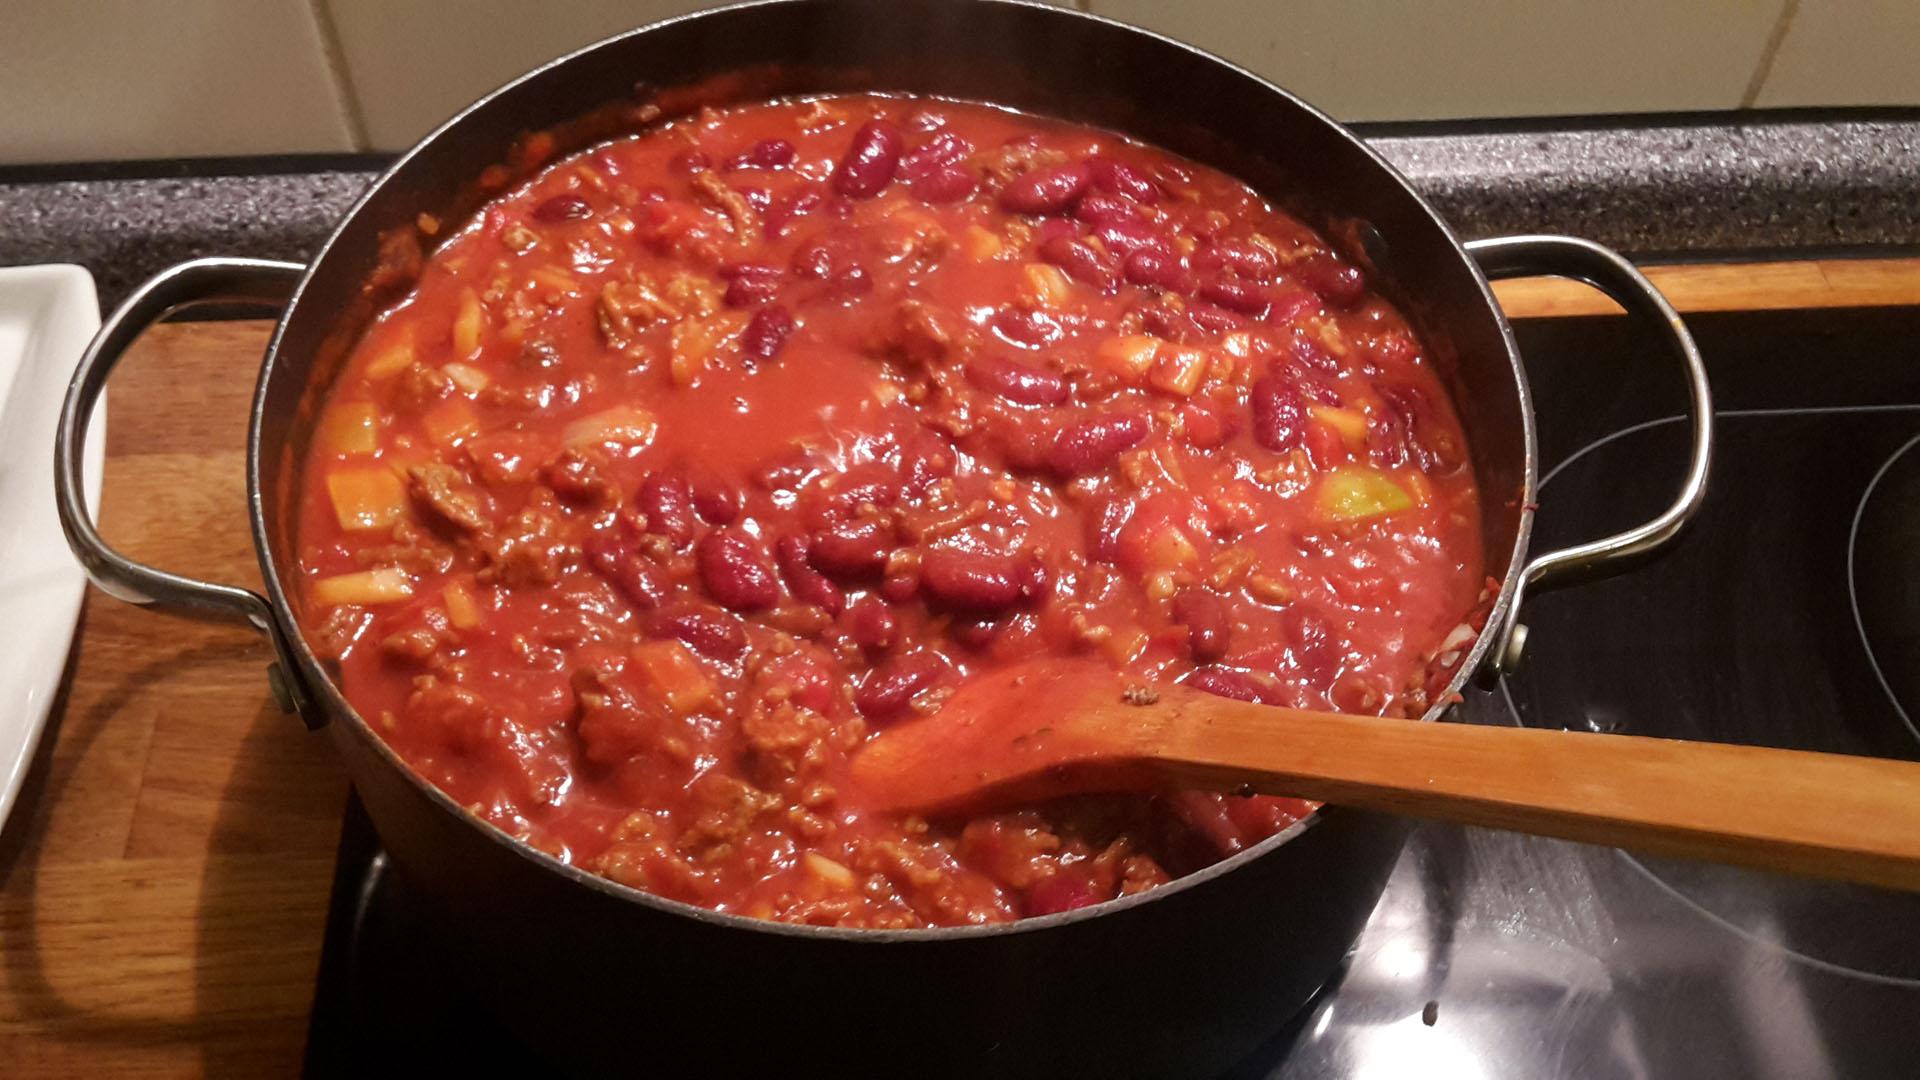 chili con carne rezept mit bild kochen. Black Bedroom Furniture Sets. Home Design Ideas